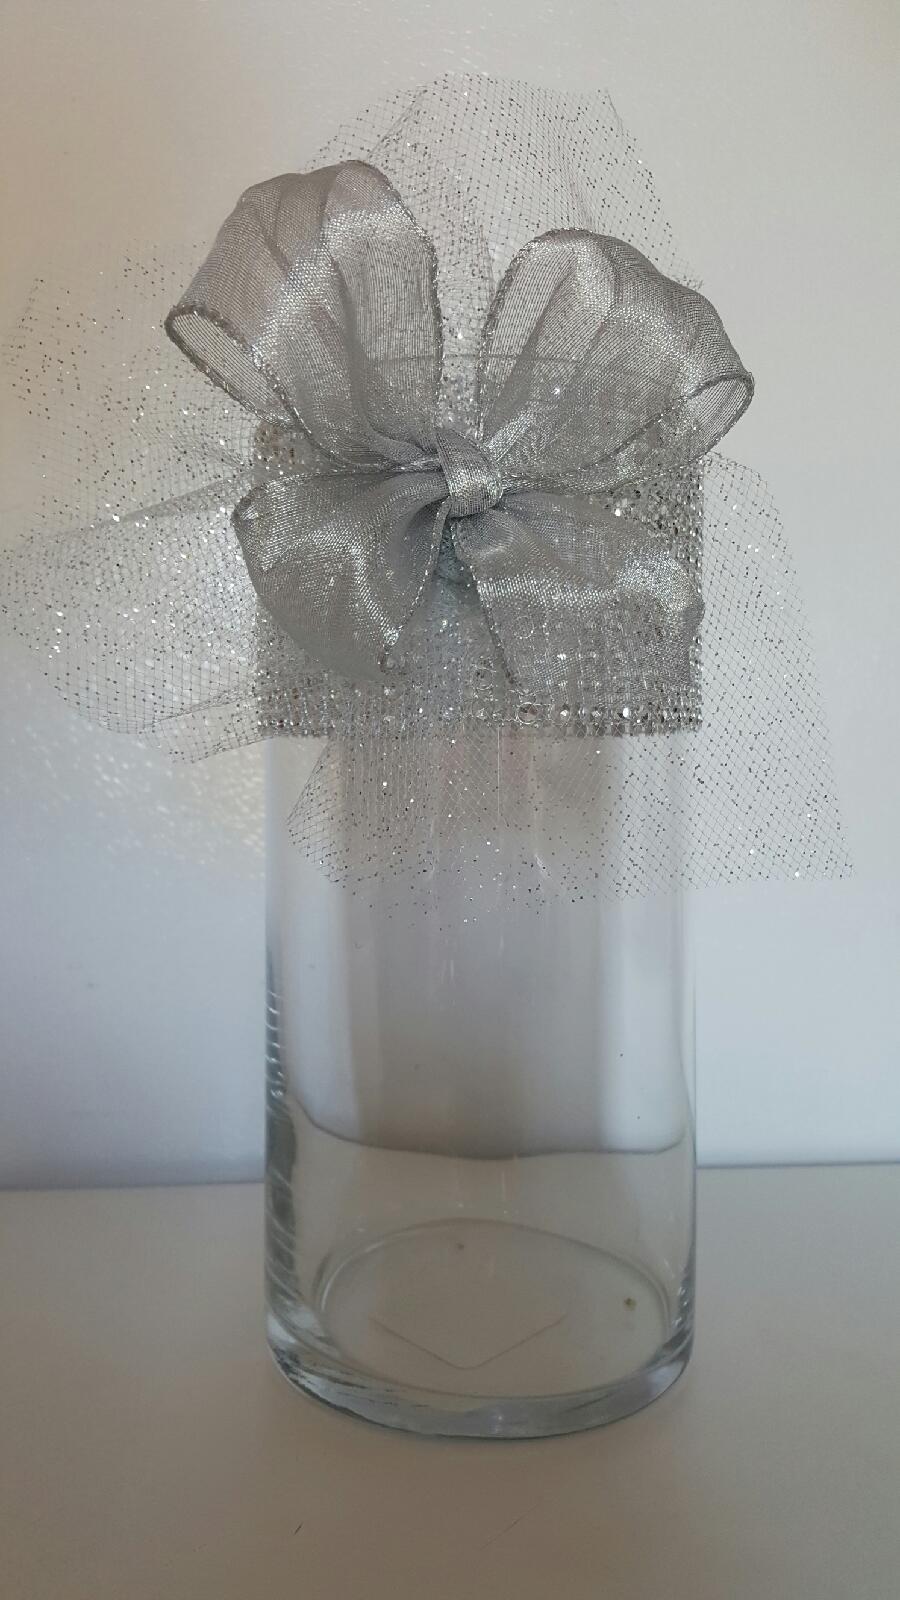 Rhinestone Mesh Amp Organza With Ribbon Wedding Centerpiece Vases Set Of 12 Wedding Decor